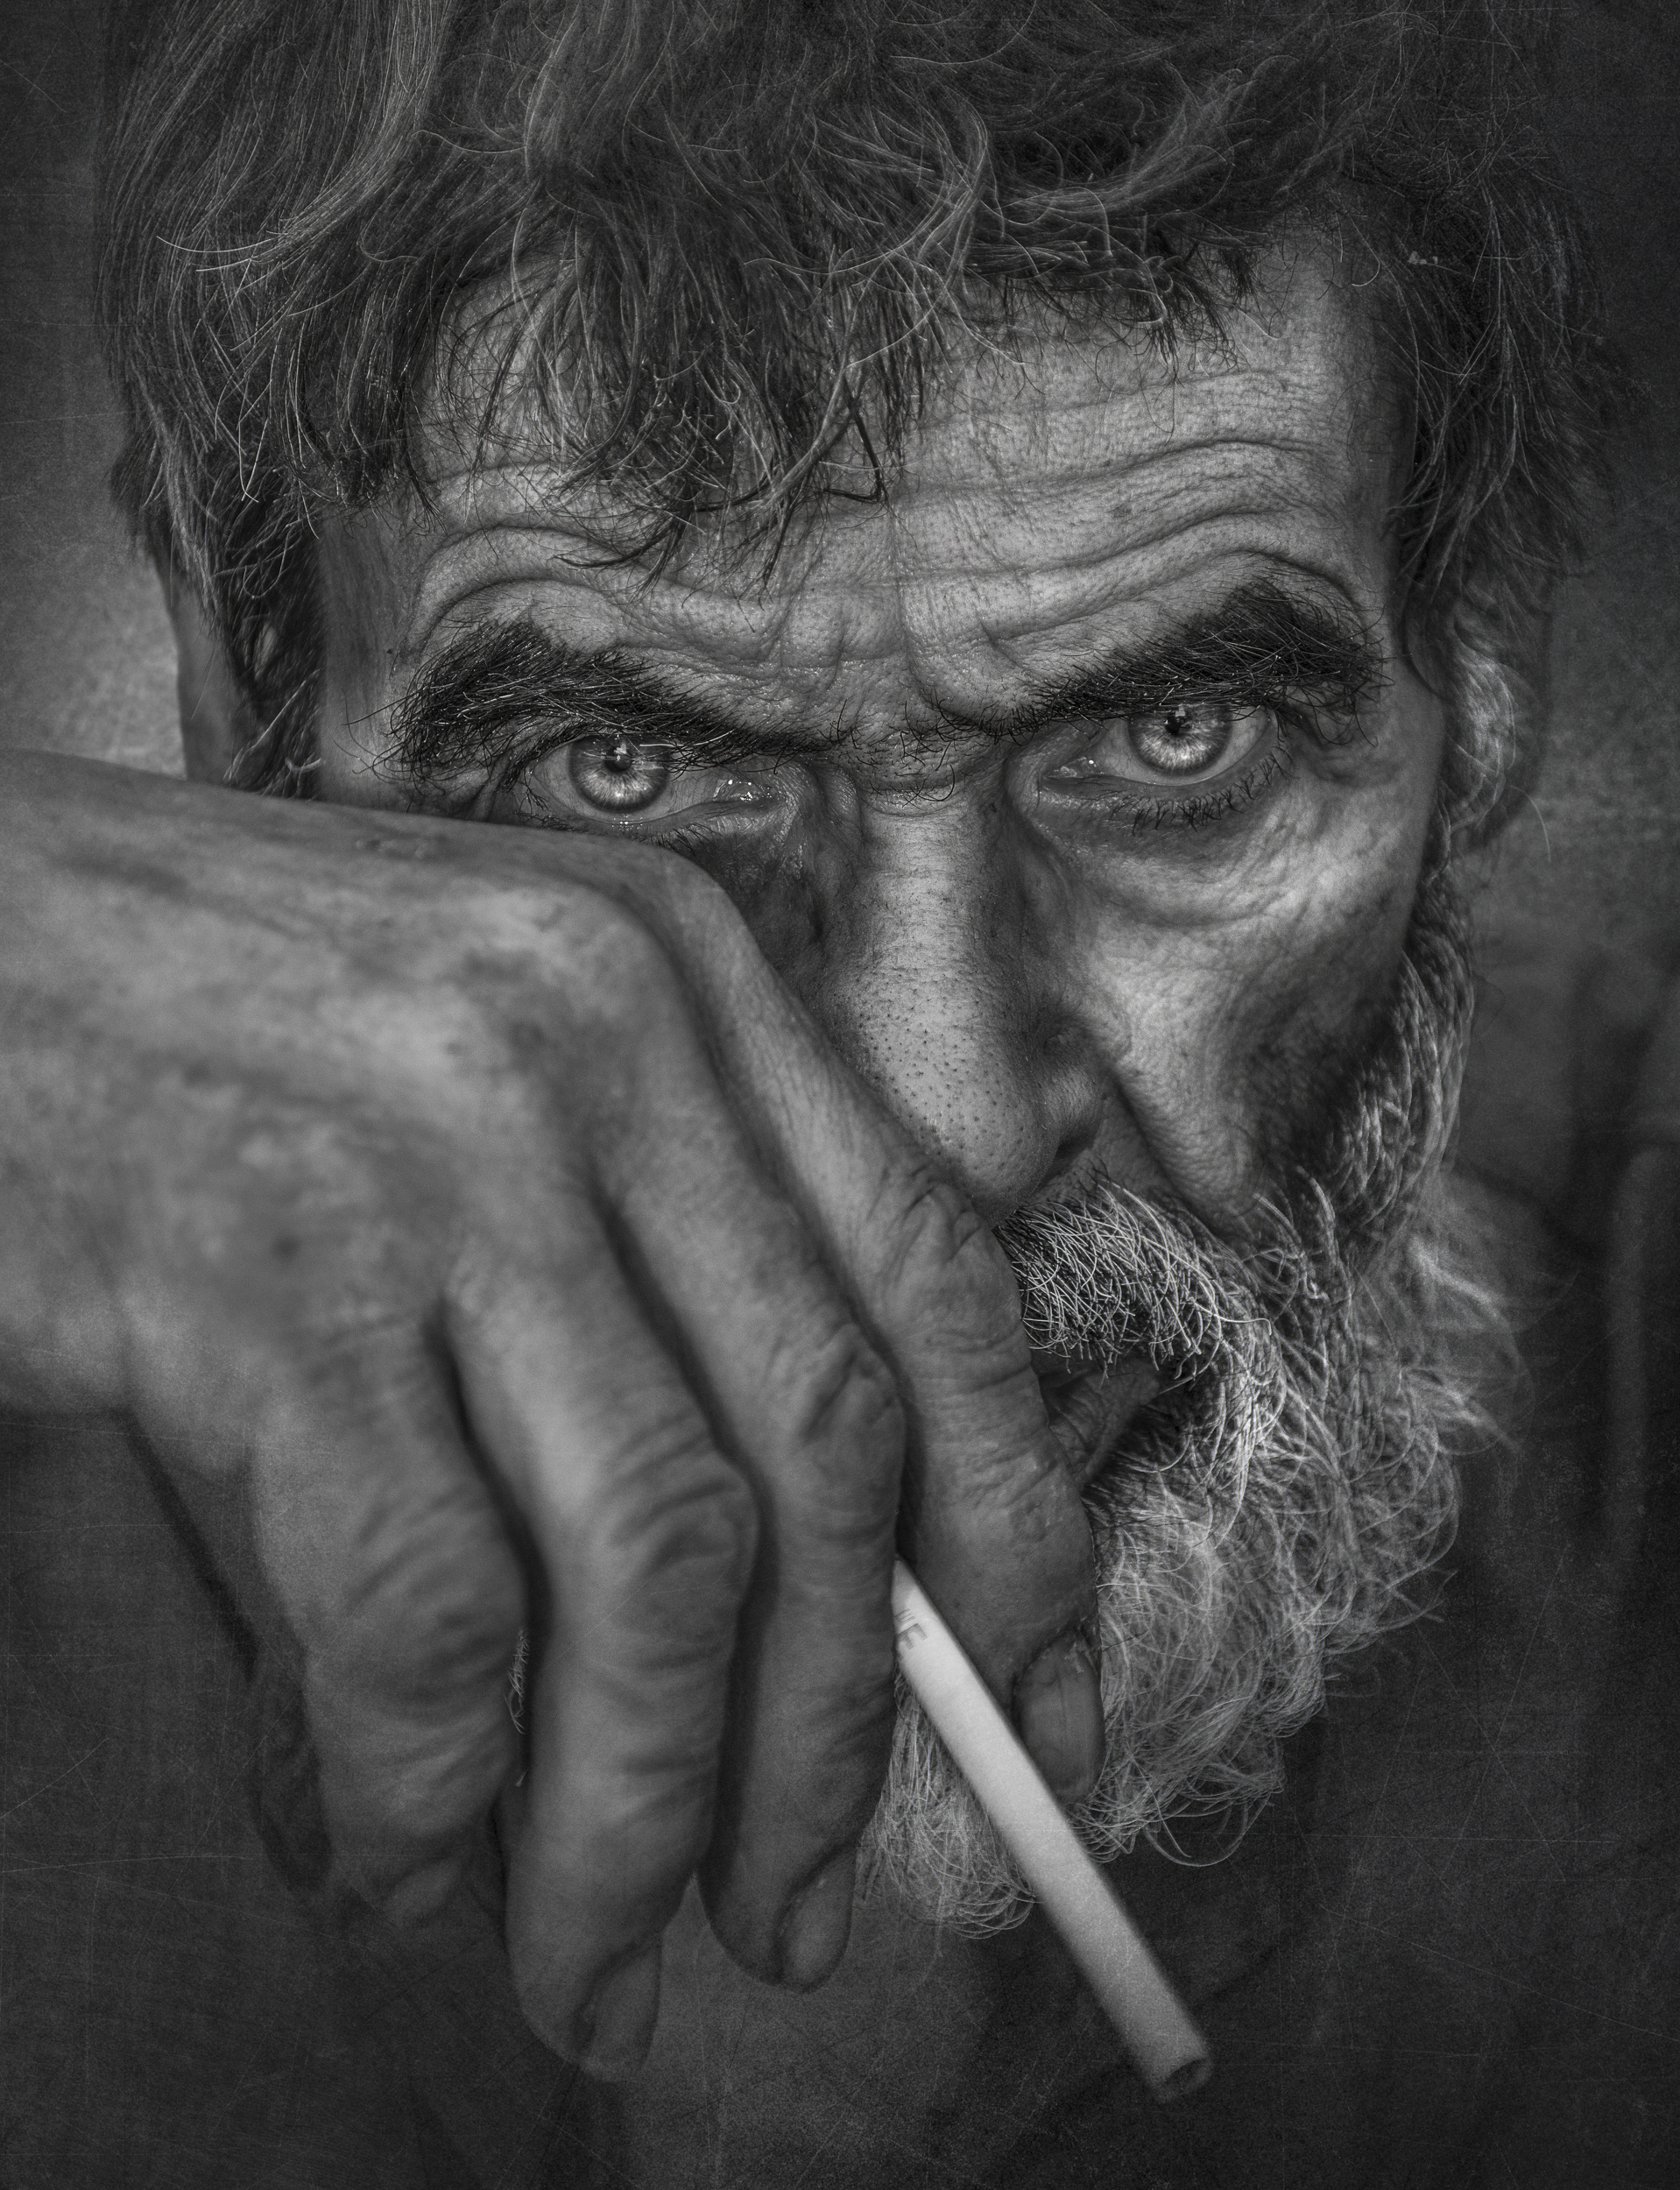 #close_up, #eye, #hand, #protrait, #people, Zavvar Mehdi